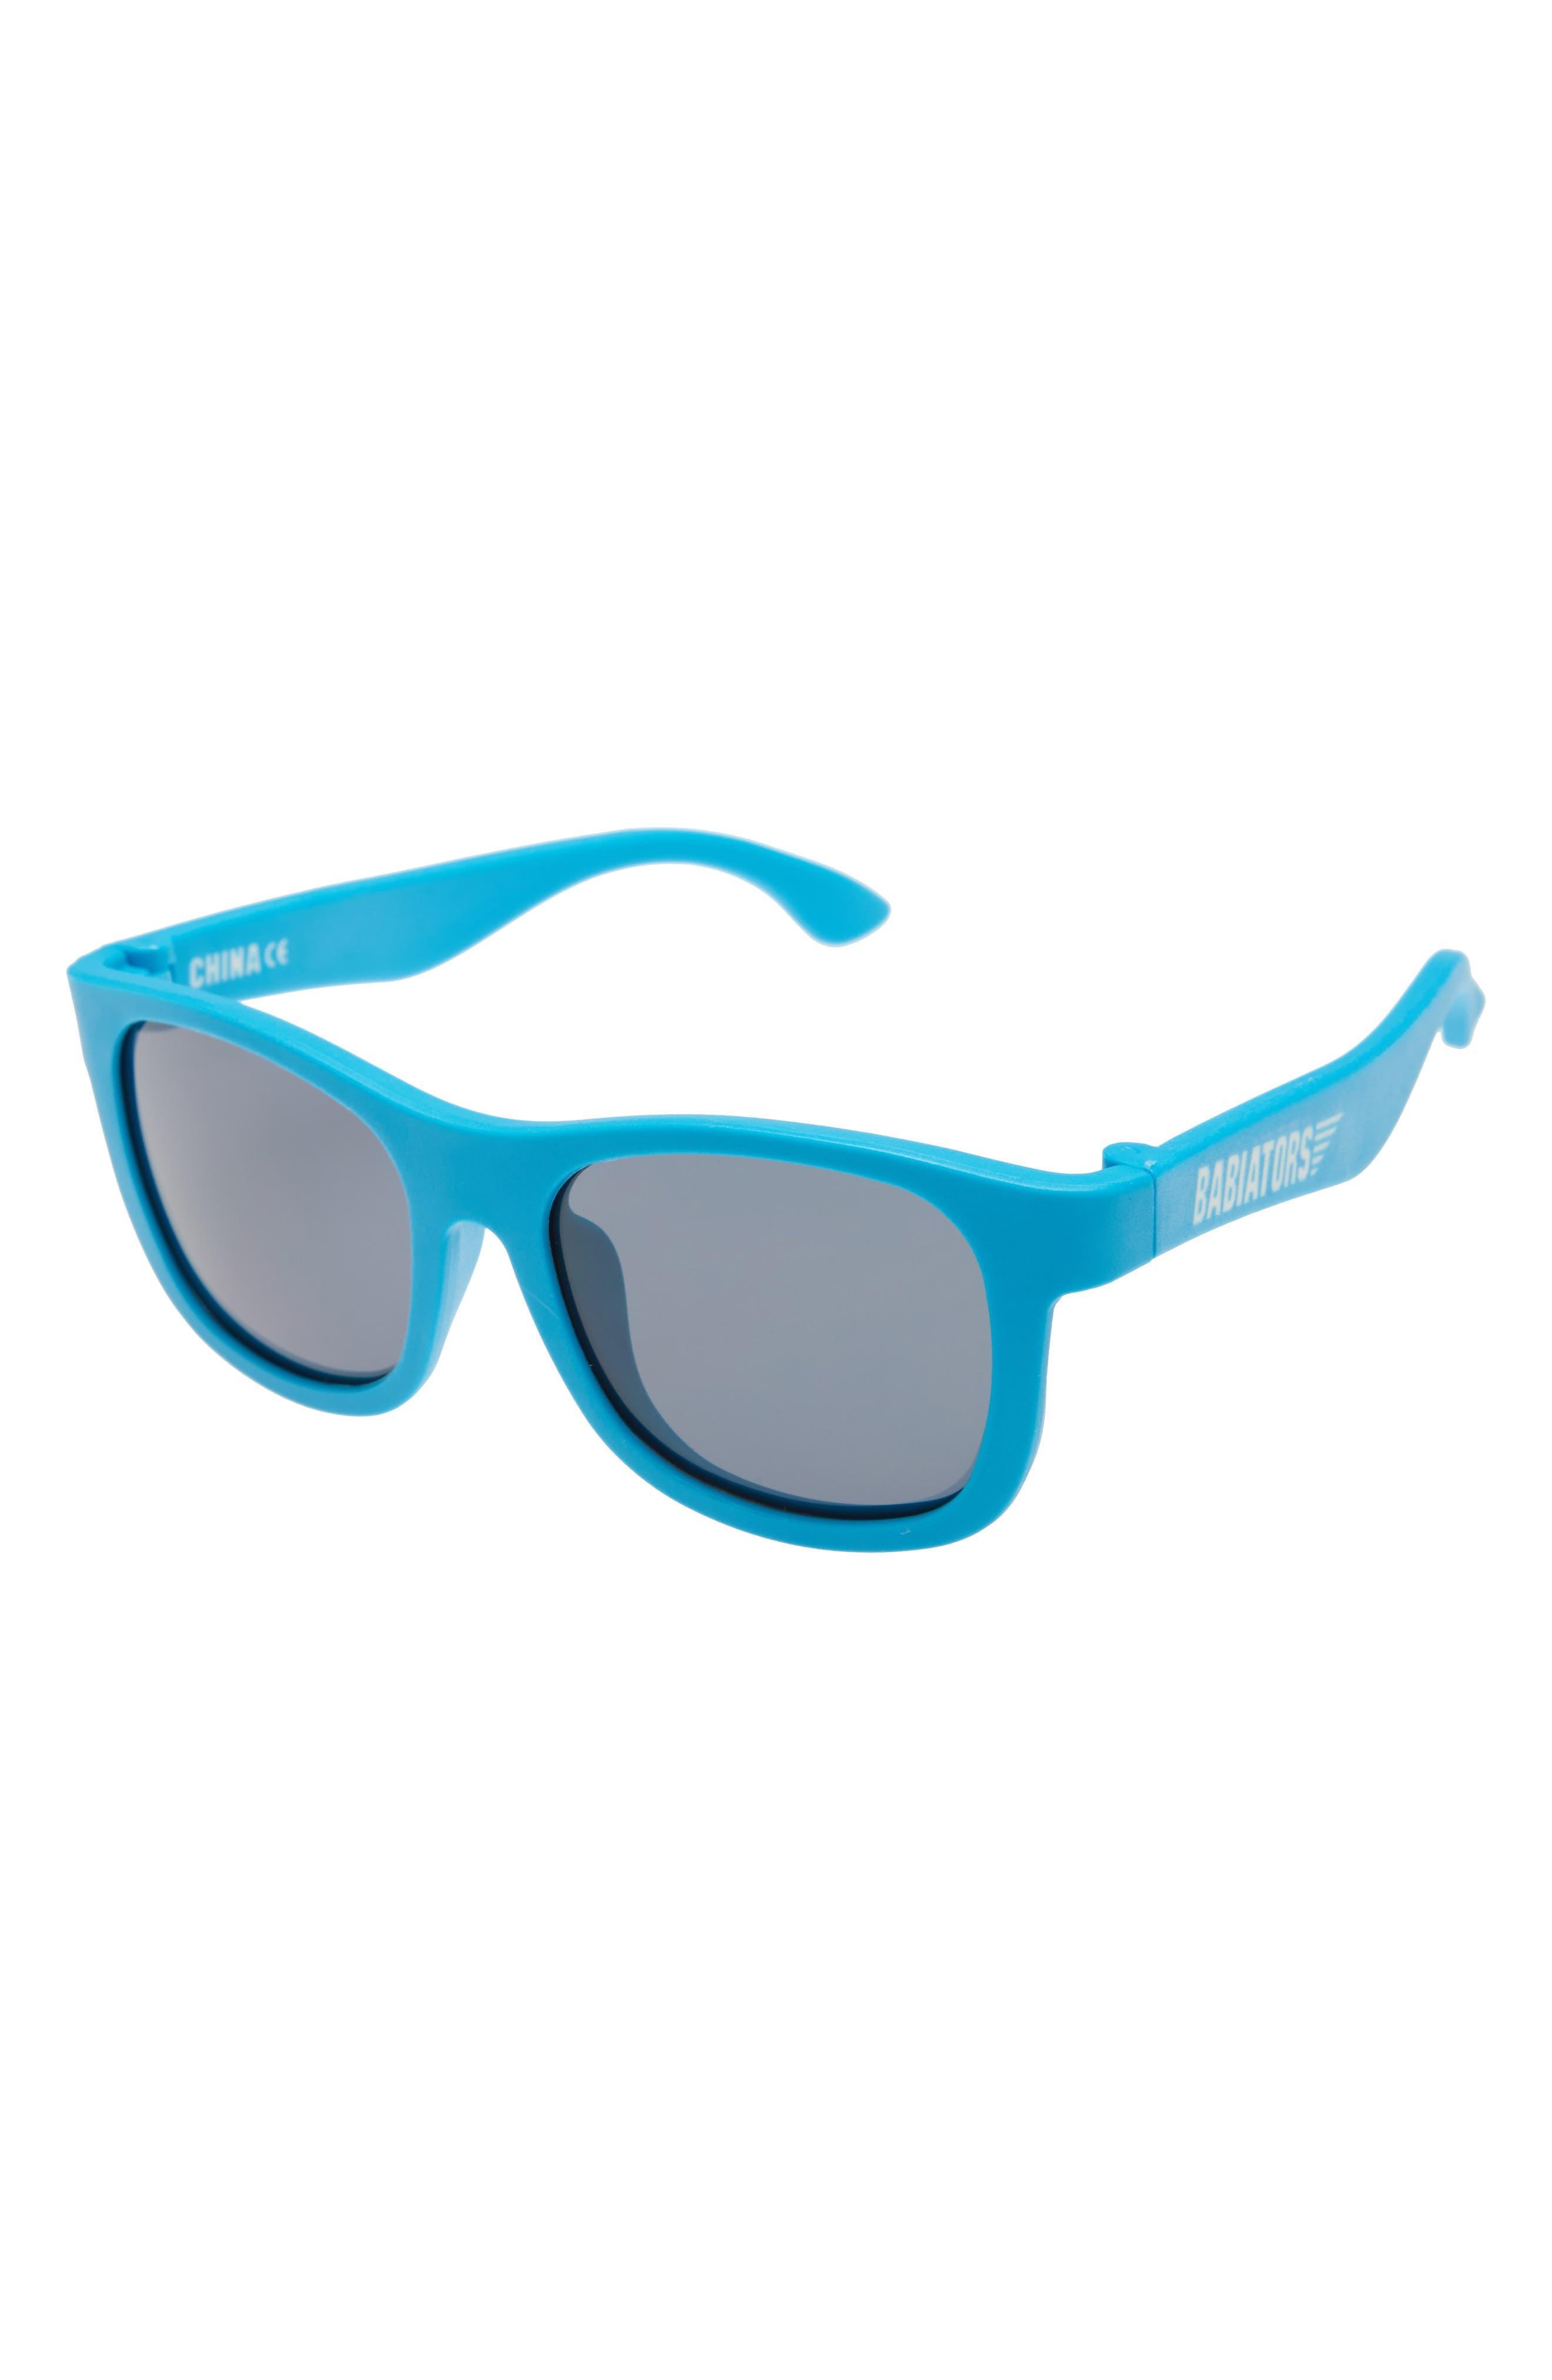 Babiators Original Navigators Sunglasses (Baby & Little Kid)